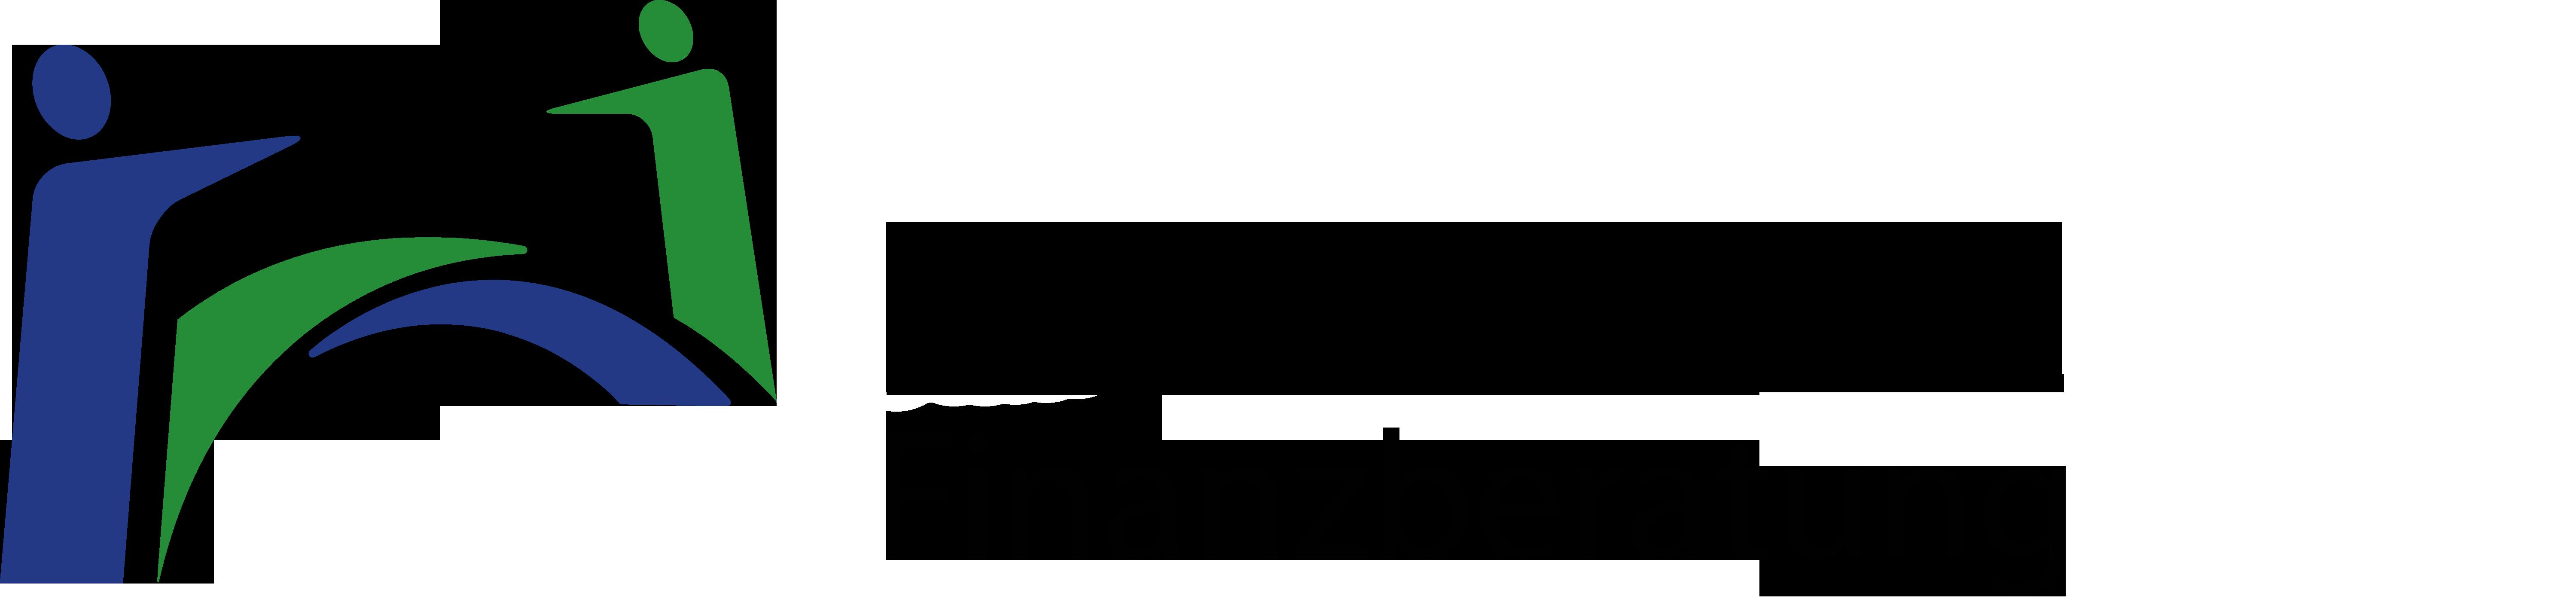 www.eh-finanzberatung.de-Logo